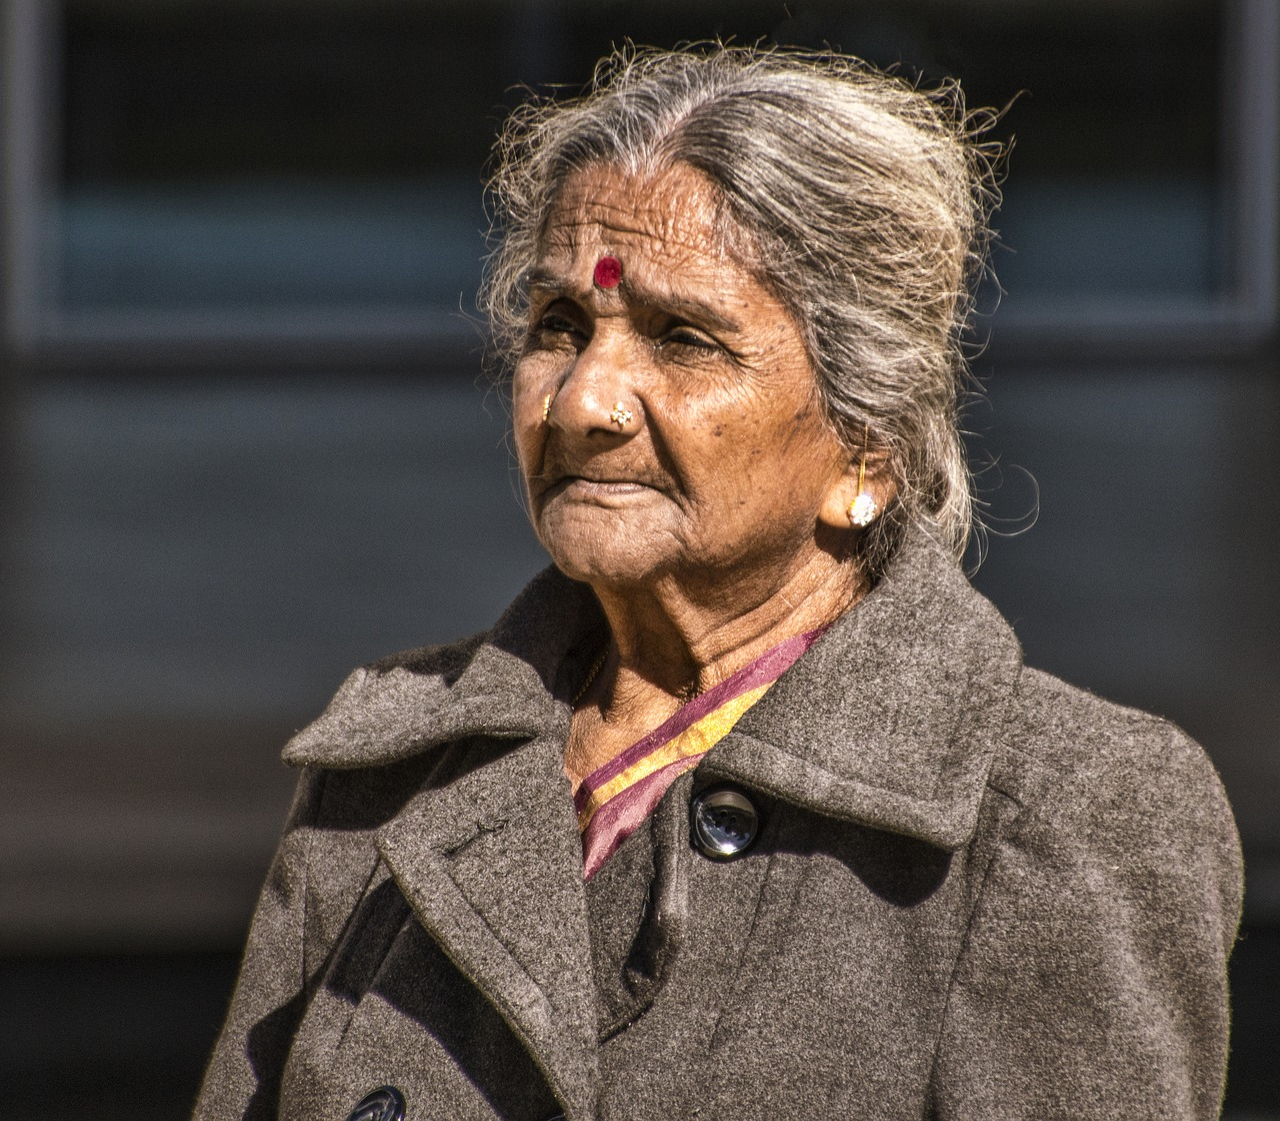 Lady Indian Woman - Free photo on Pixabay